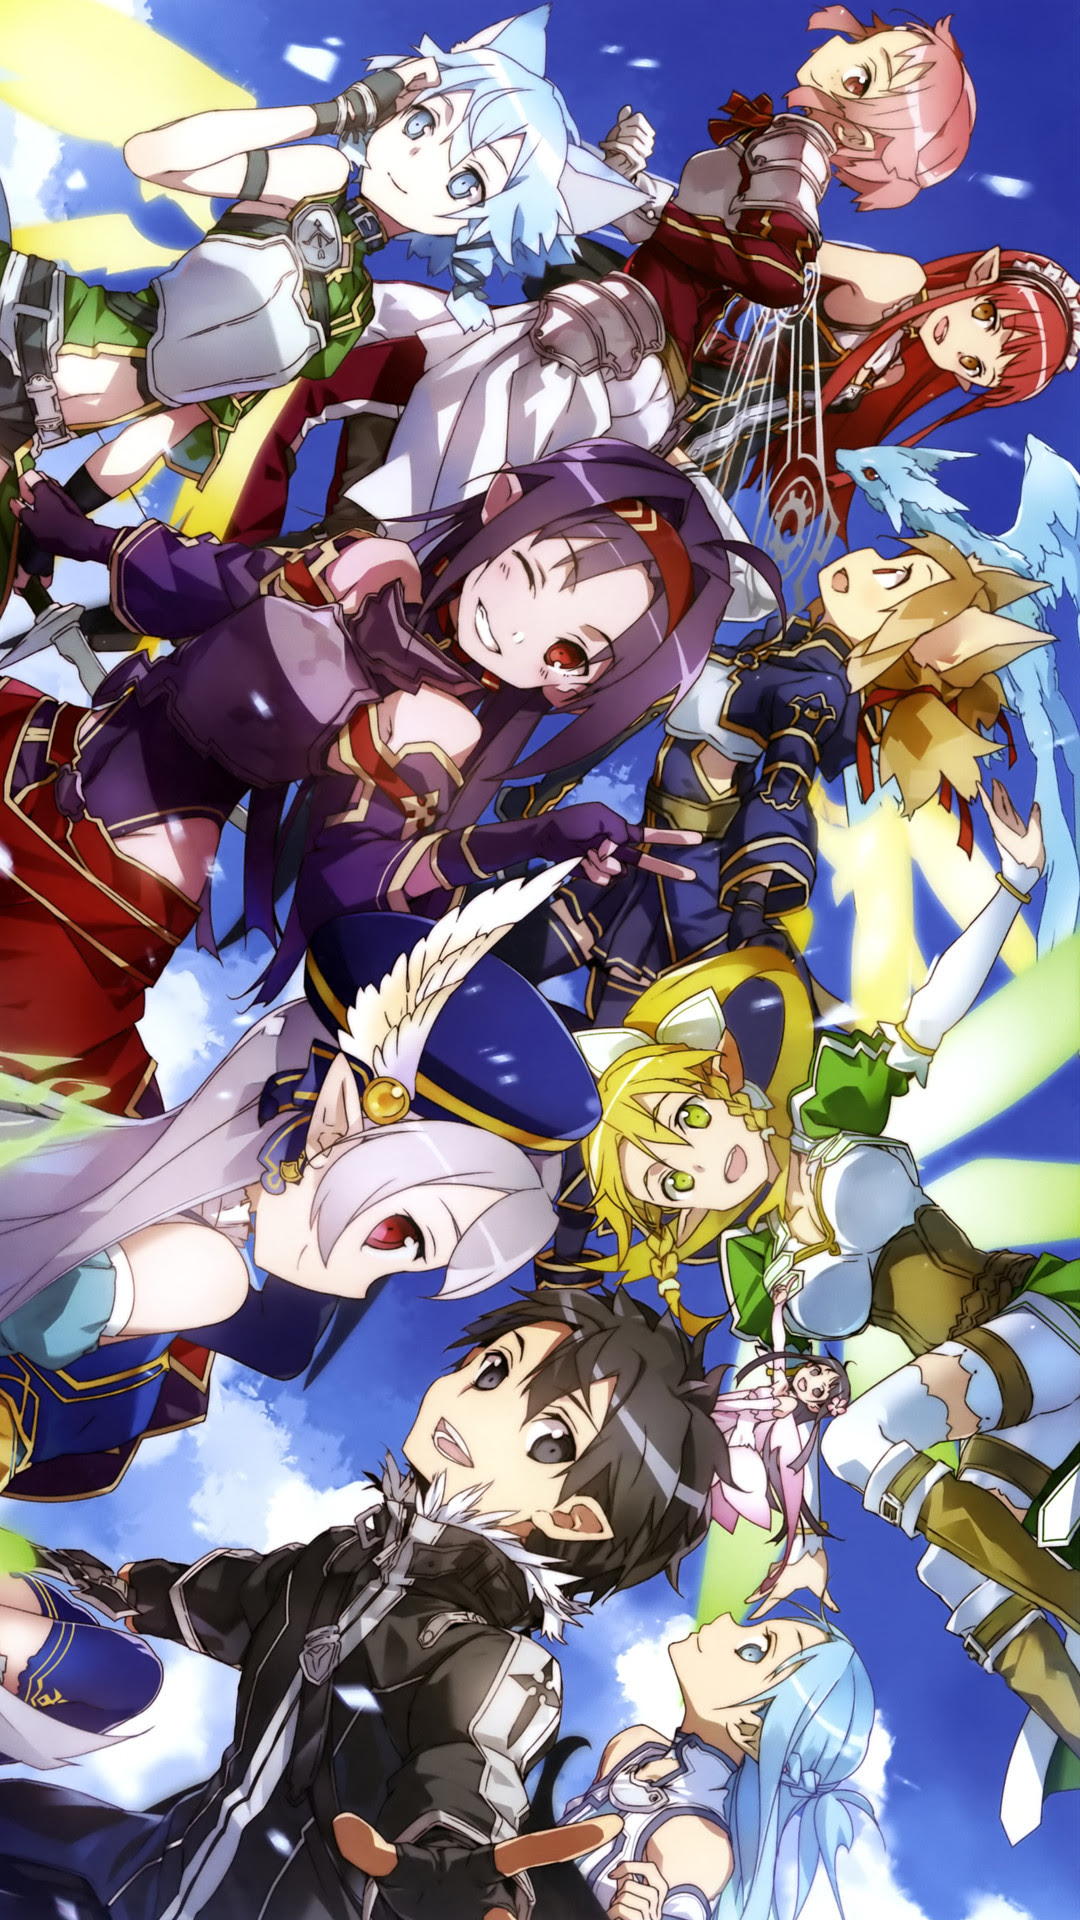 Download Wallpaper Hd For Mobile Anime Hd Cikimm Com